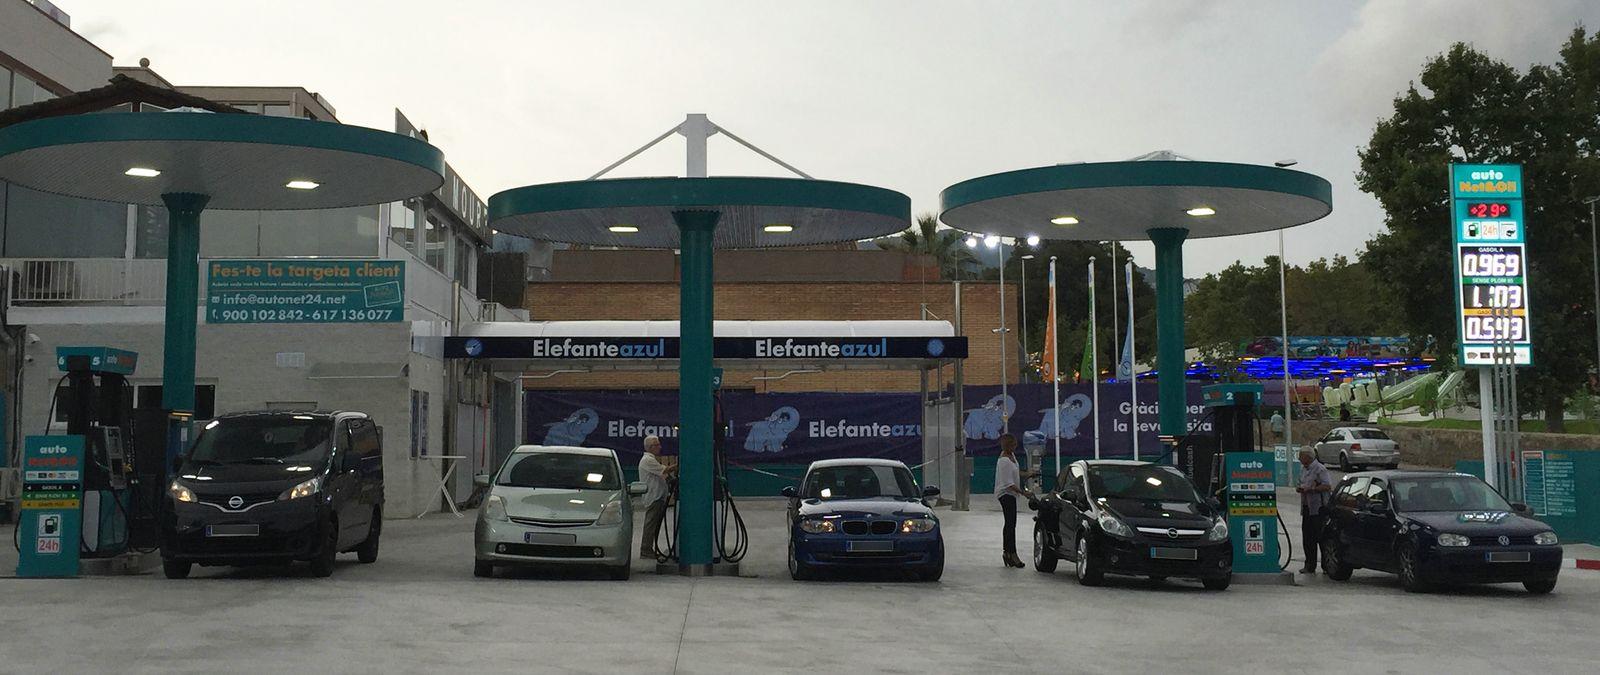 Gasolinera Alella [1600x1200]